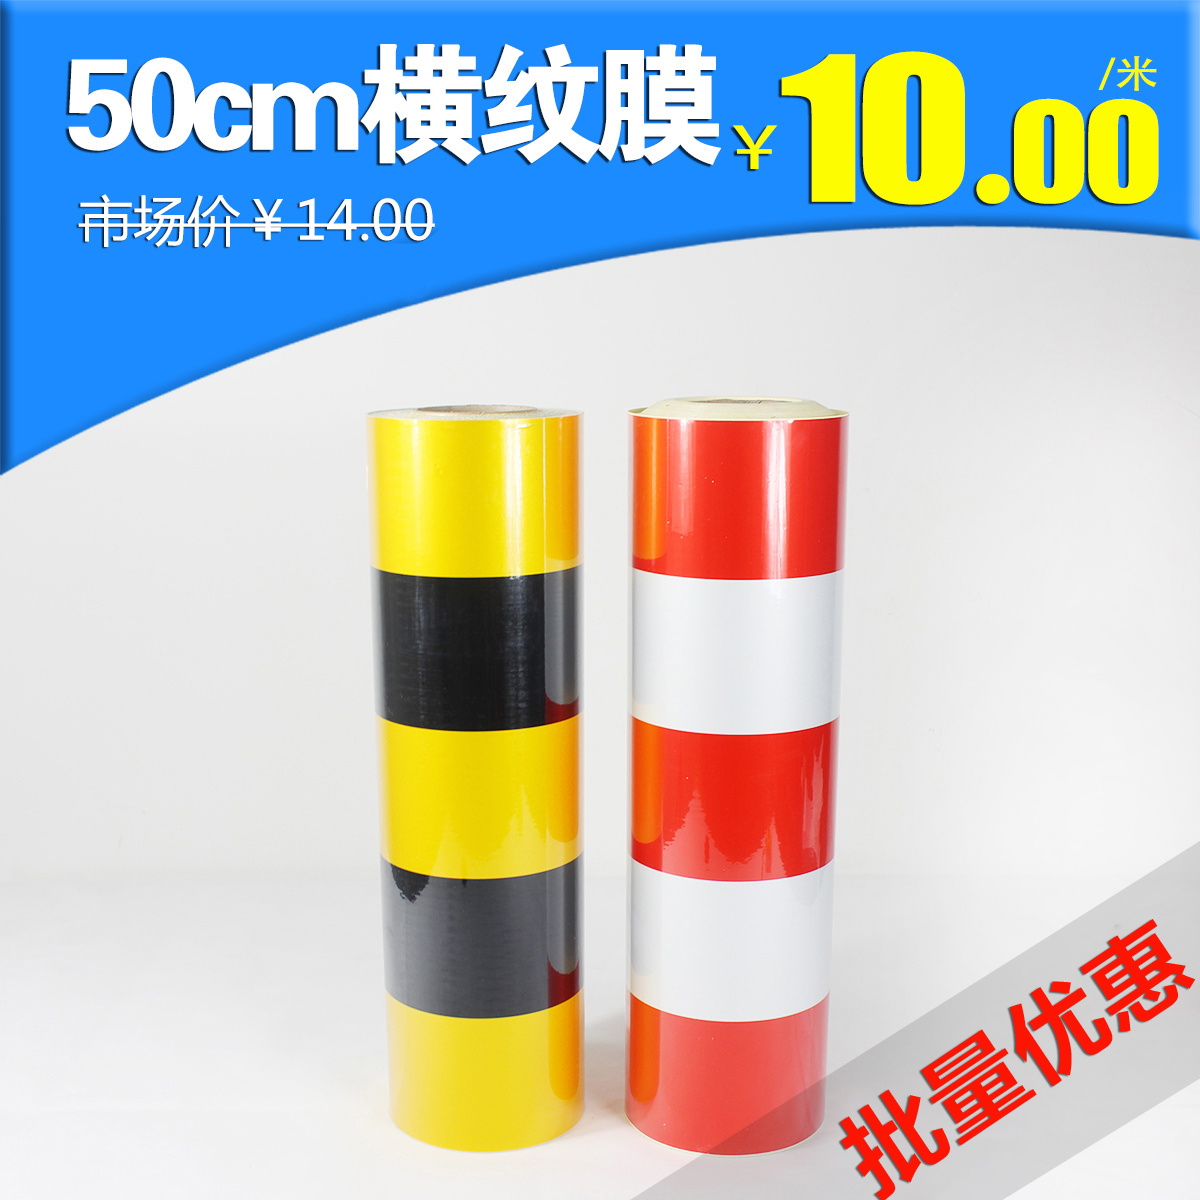 MNSD红白黄黑警示桩反光膜电线杆电力反光贴道路膜反光柱子贴纸